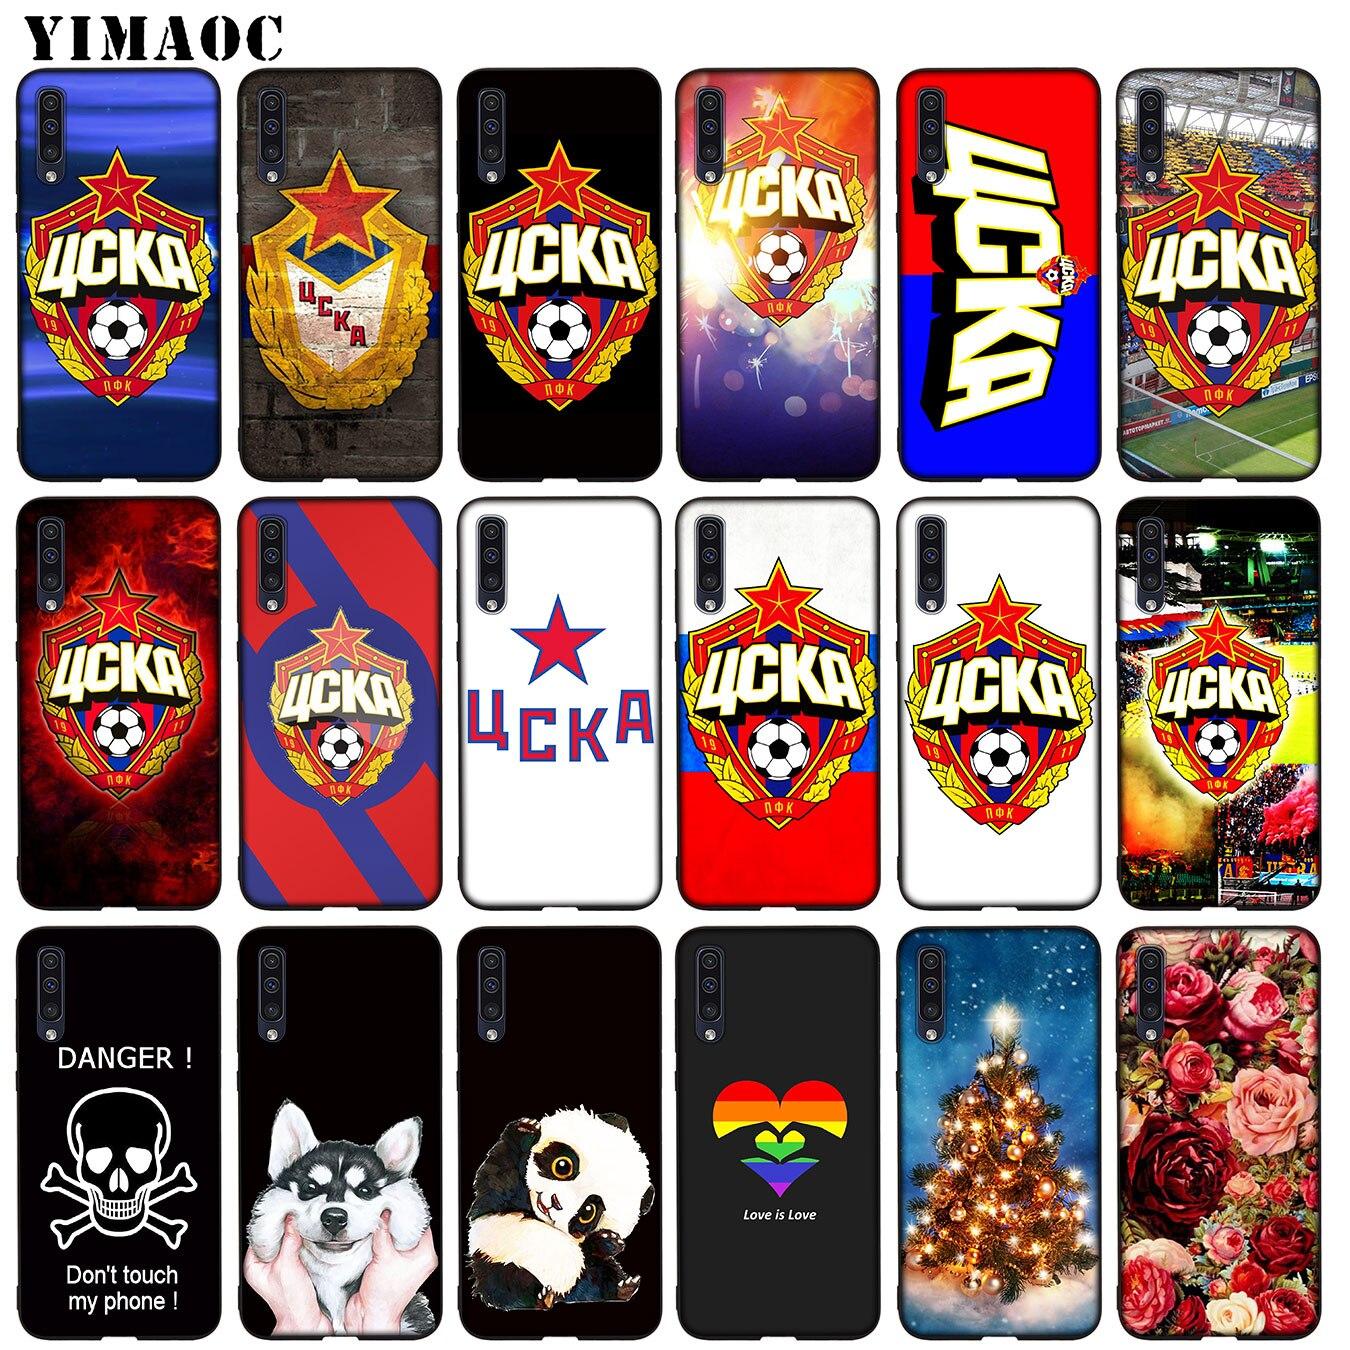 YIMAOC CSKA Moscou En Silicone TPU Souple étui pour samsung Galaxy A70 A60 A50 A40 A30 A20 A10 A50S A40S A30S A20S A10S Couverture